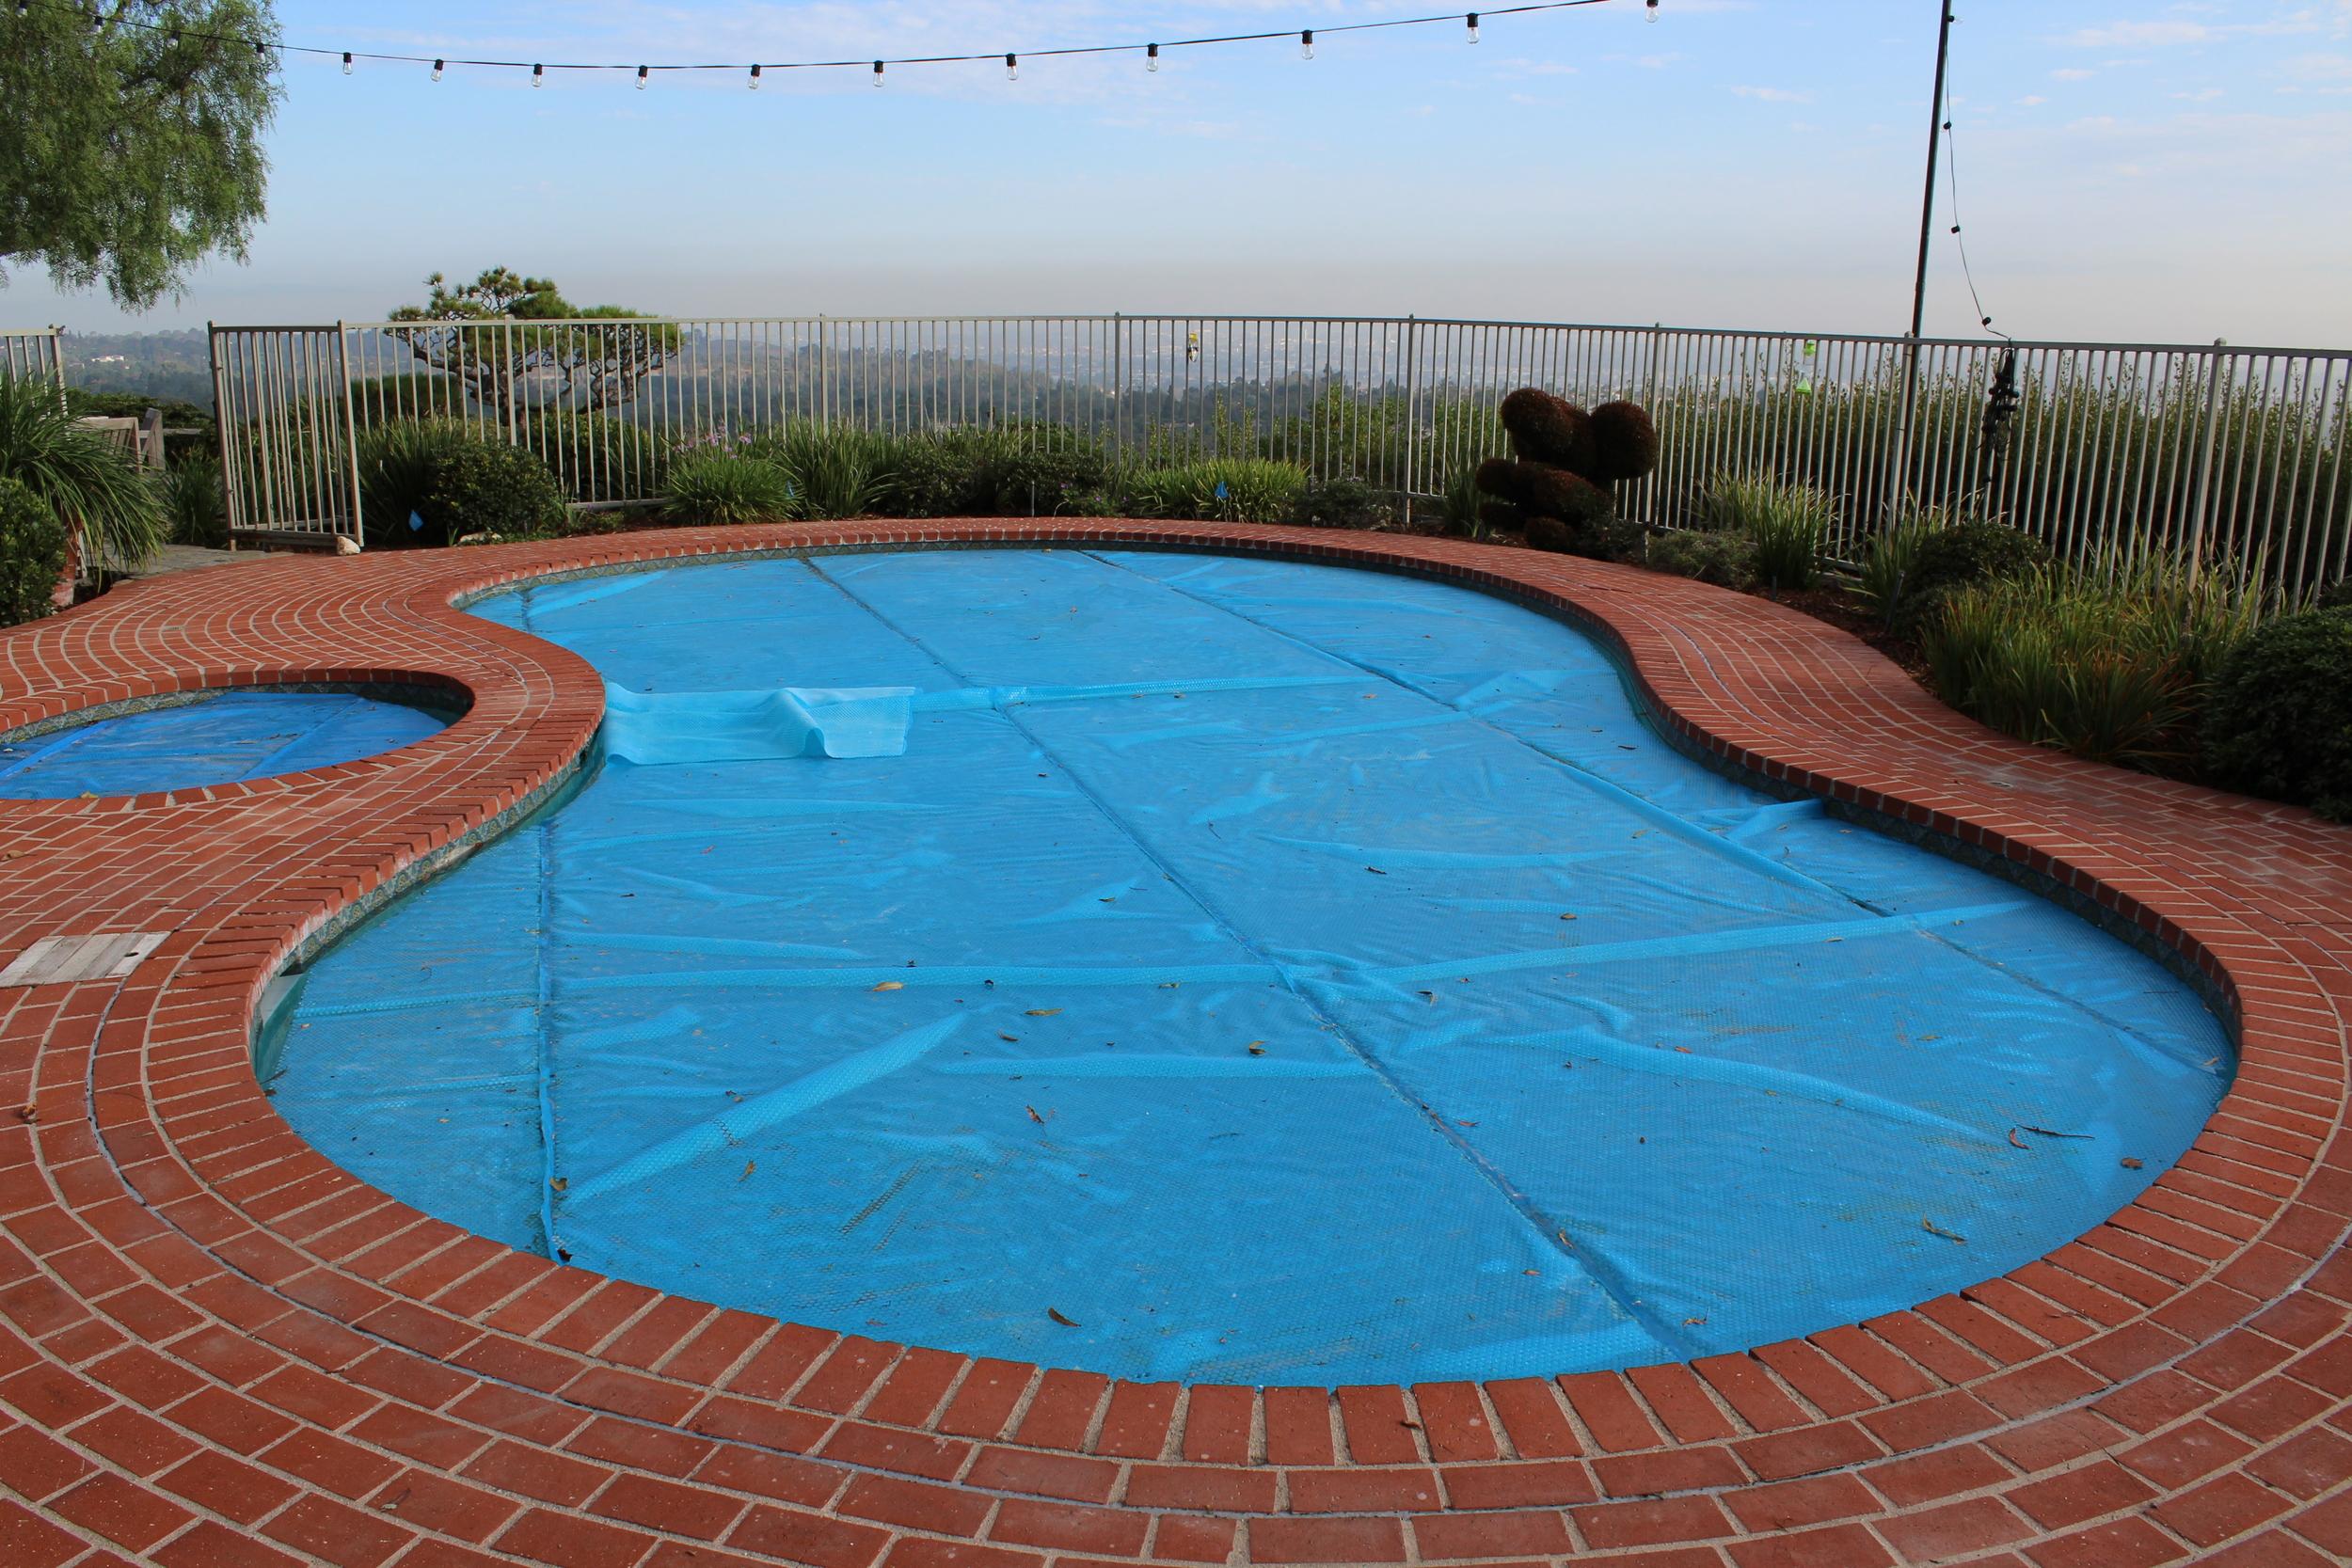 pool cover rentals